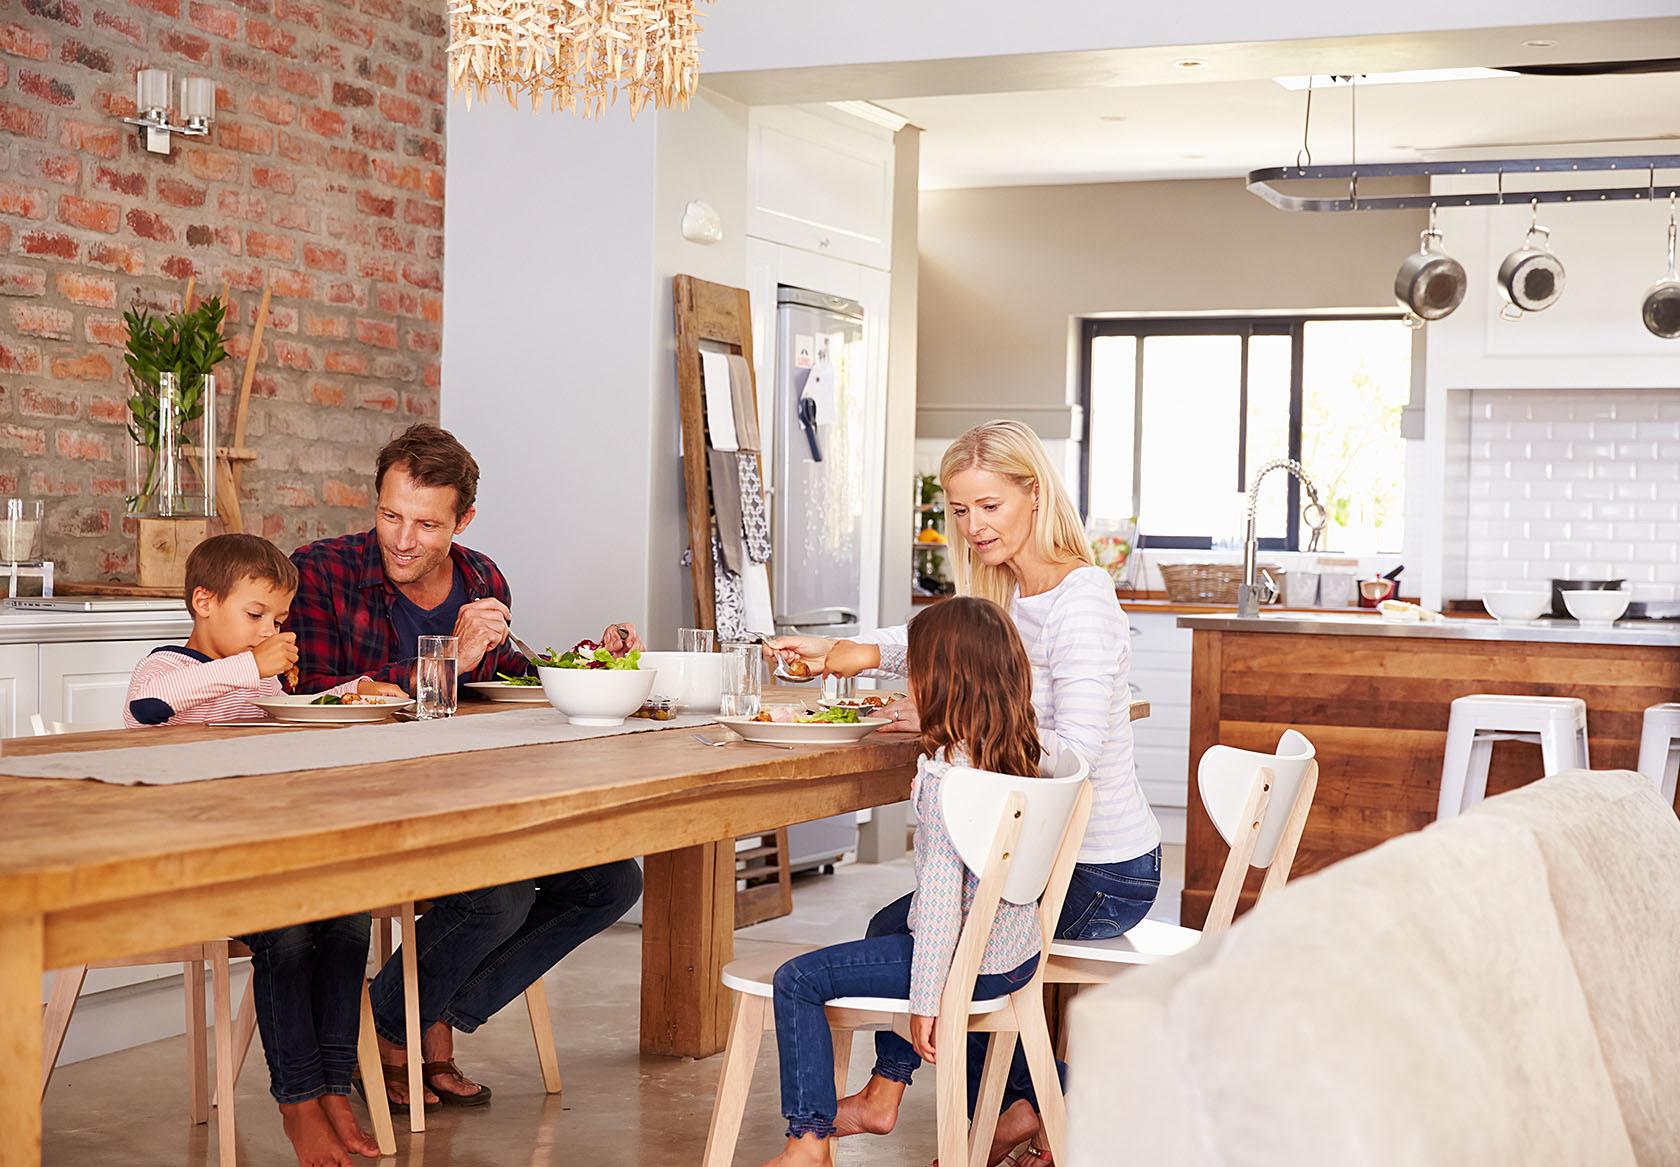 landhaus-kueche-planen-familie-essen-kochen